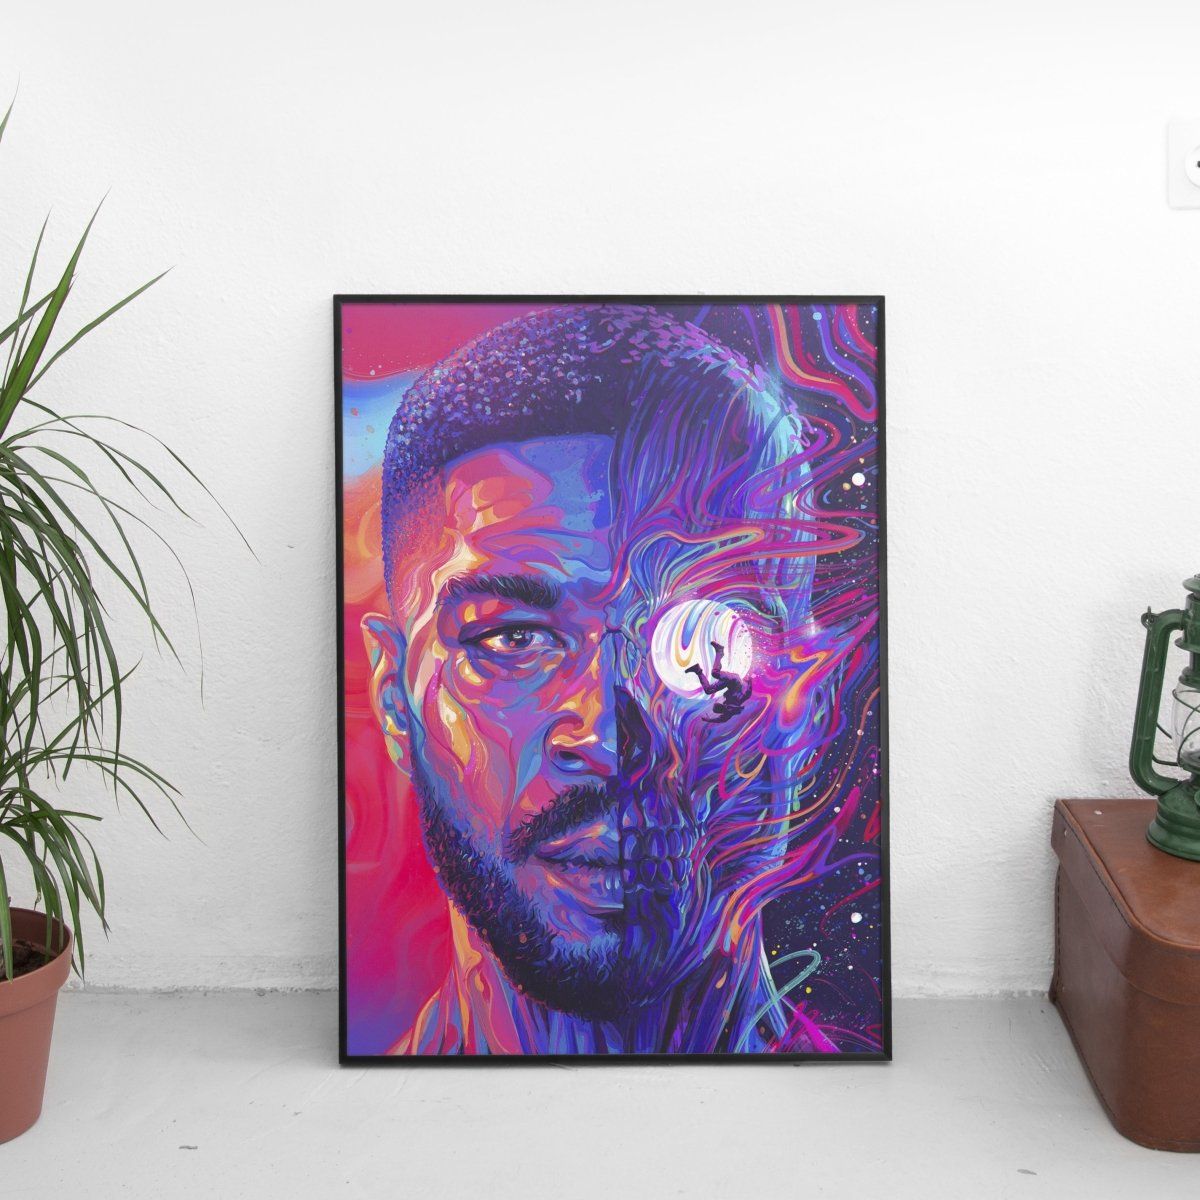 Kid Cudi - Man On The Moon III The Chosen Cover Art Poster